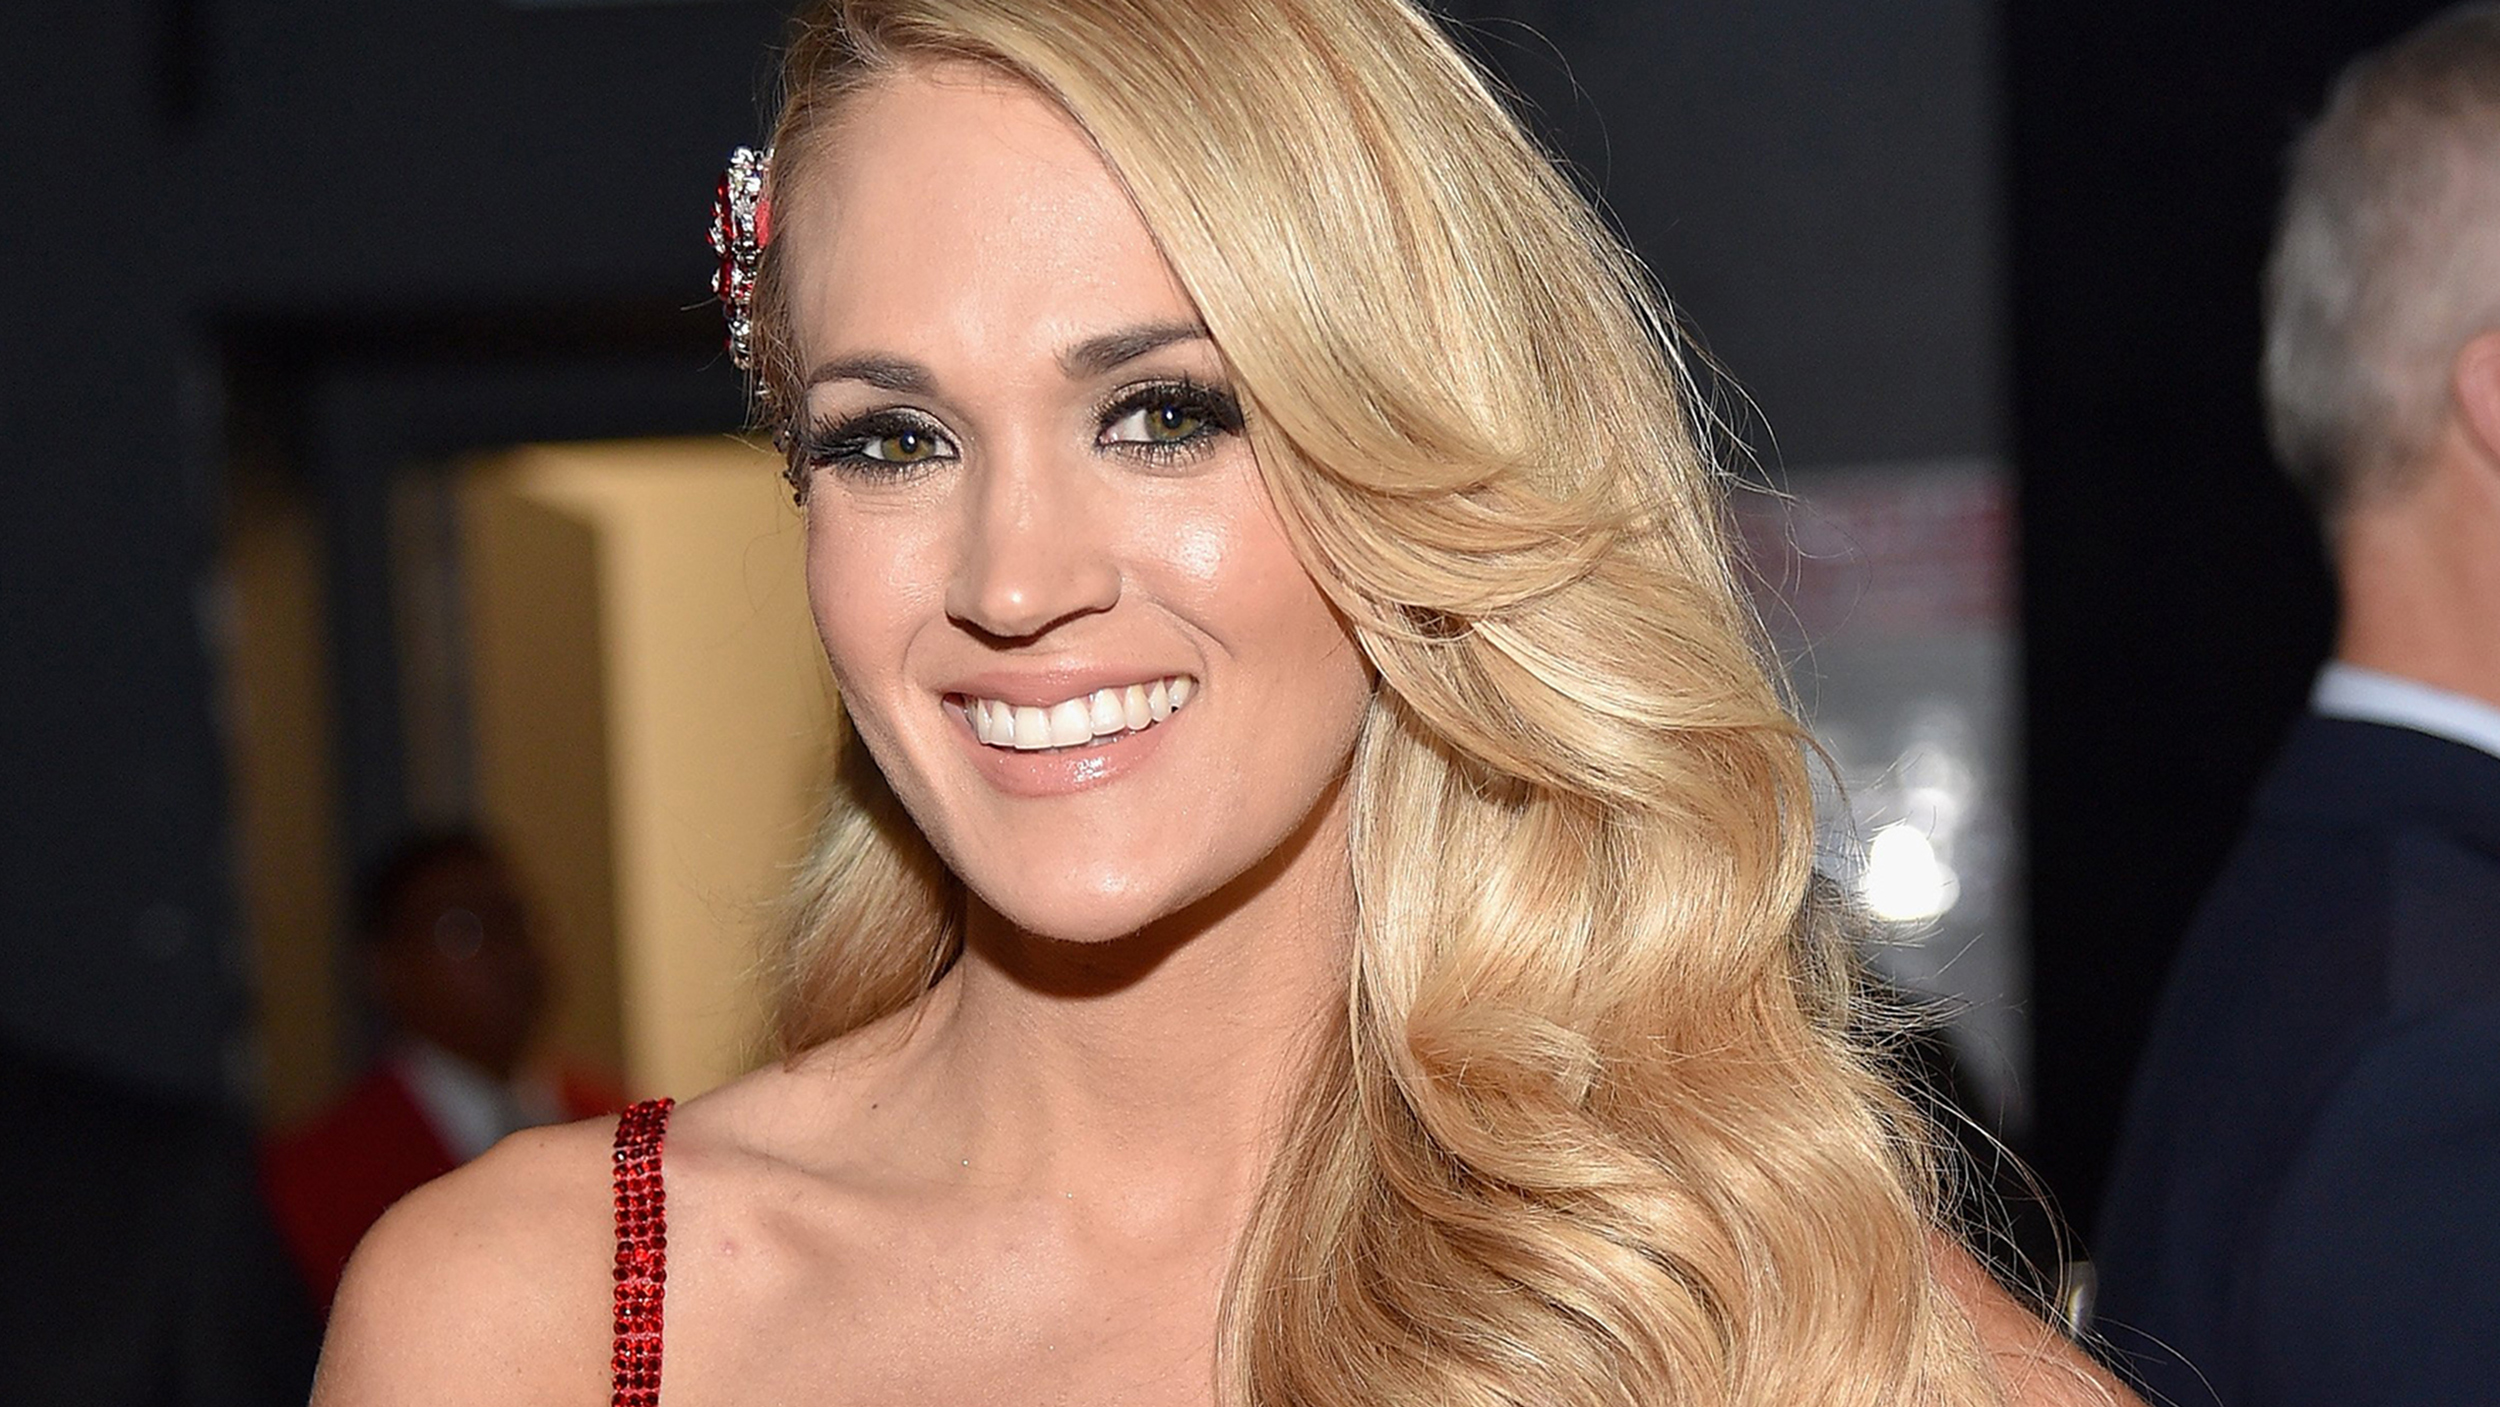 Carrie Underwood Hair Style: Carrie Underwood Debuts Shorter, Trendy Lob Haircut On